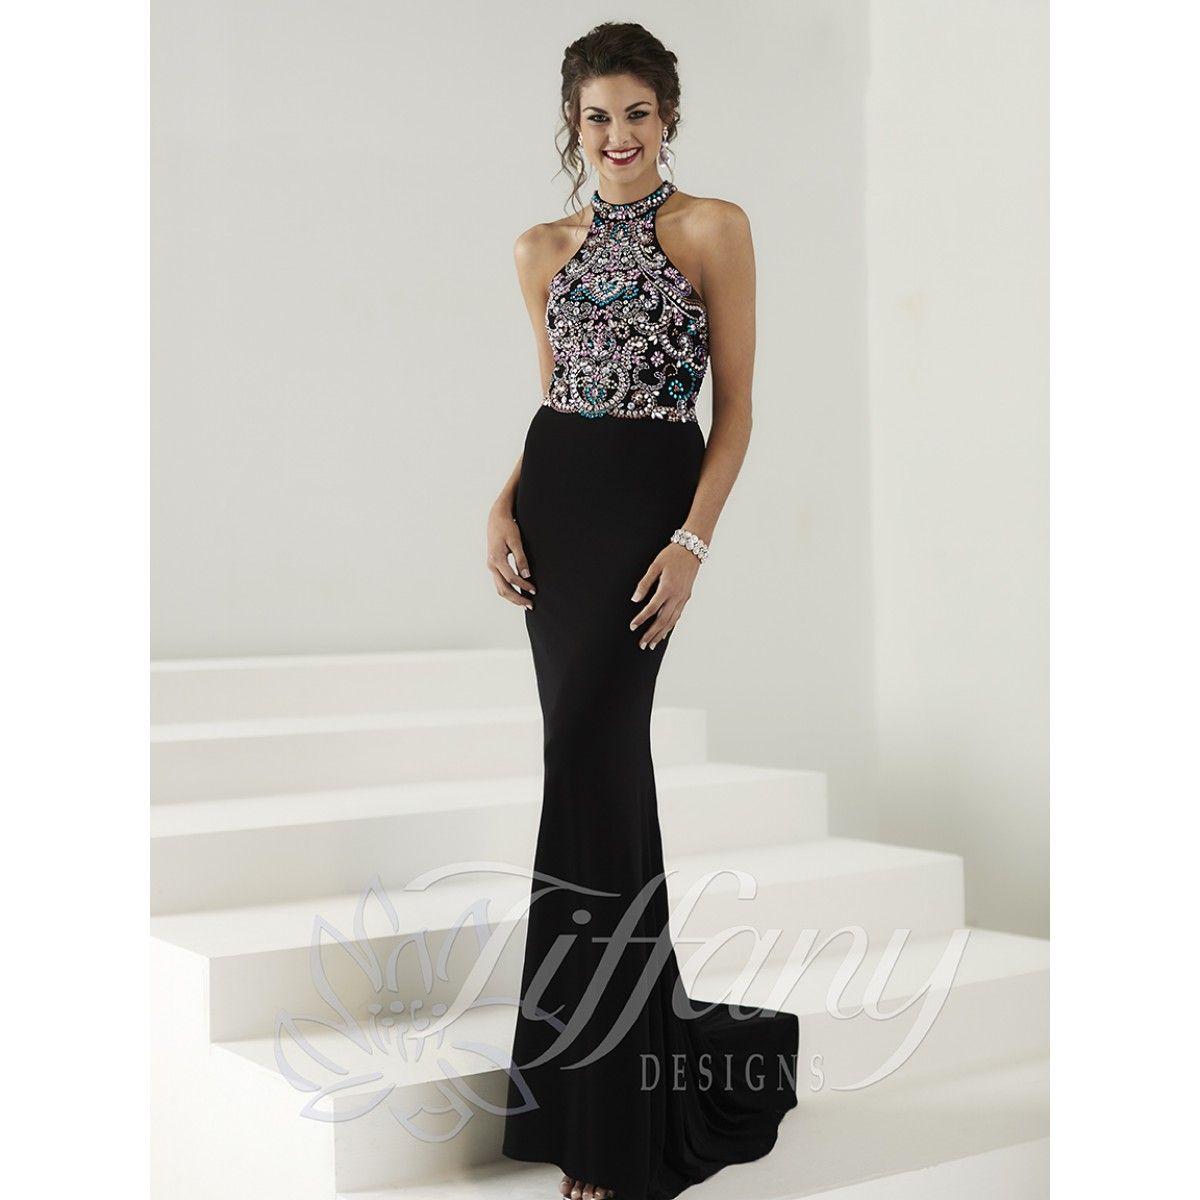 Tiffany designs style tiffany designs promm pinterest